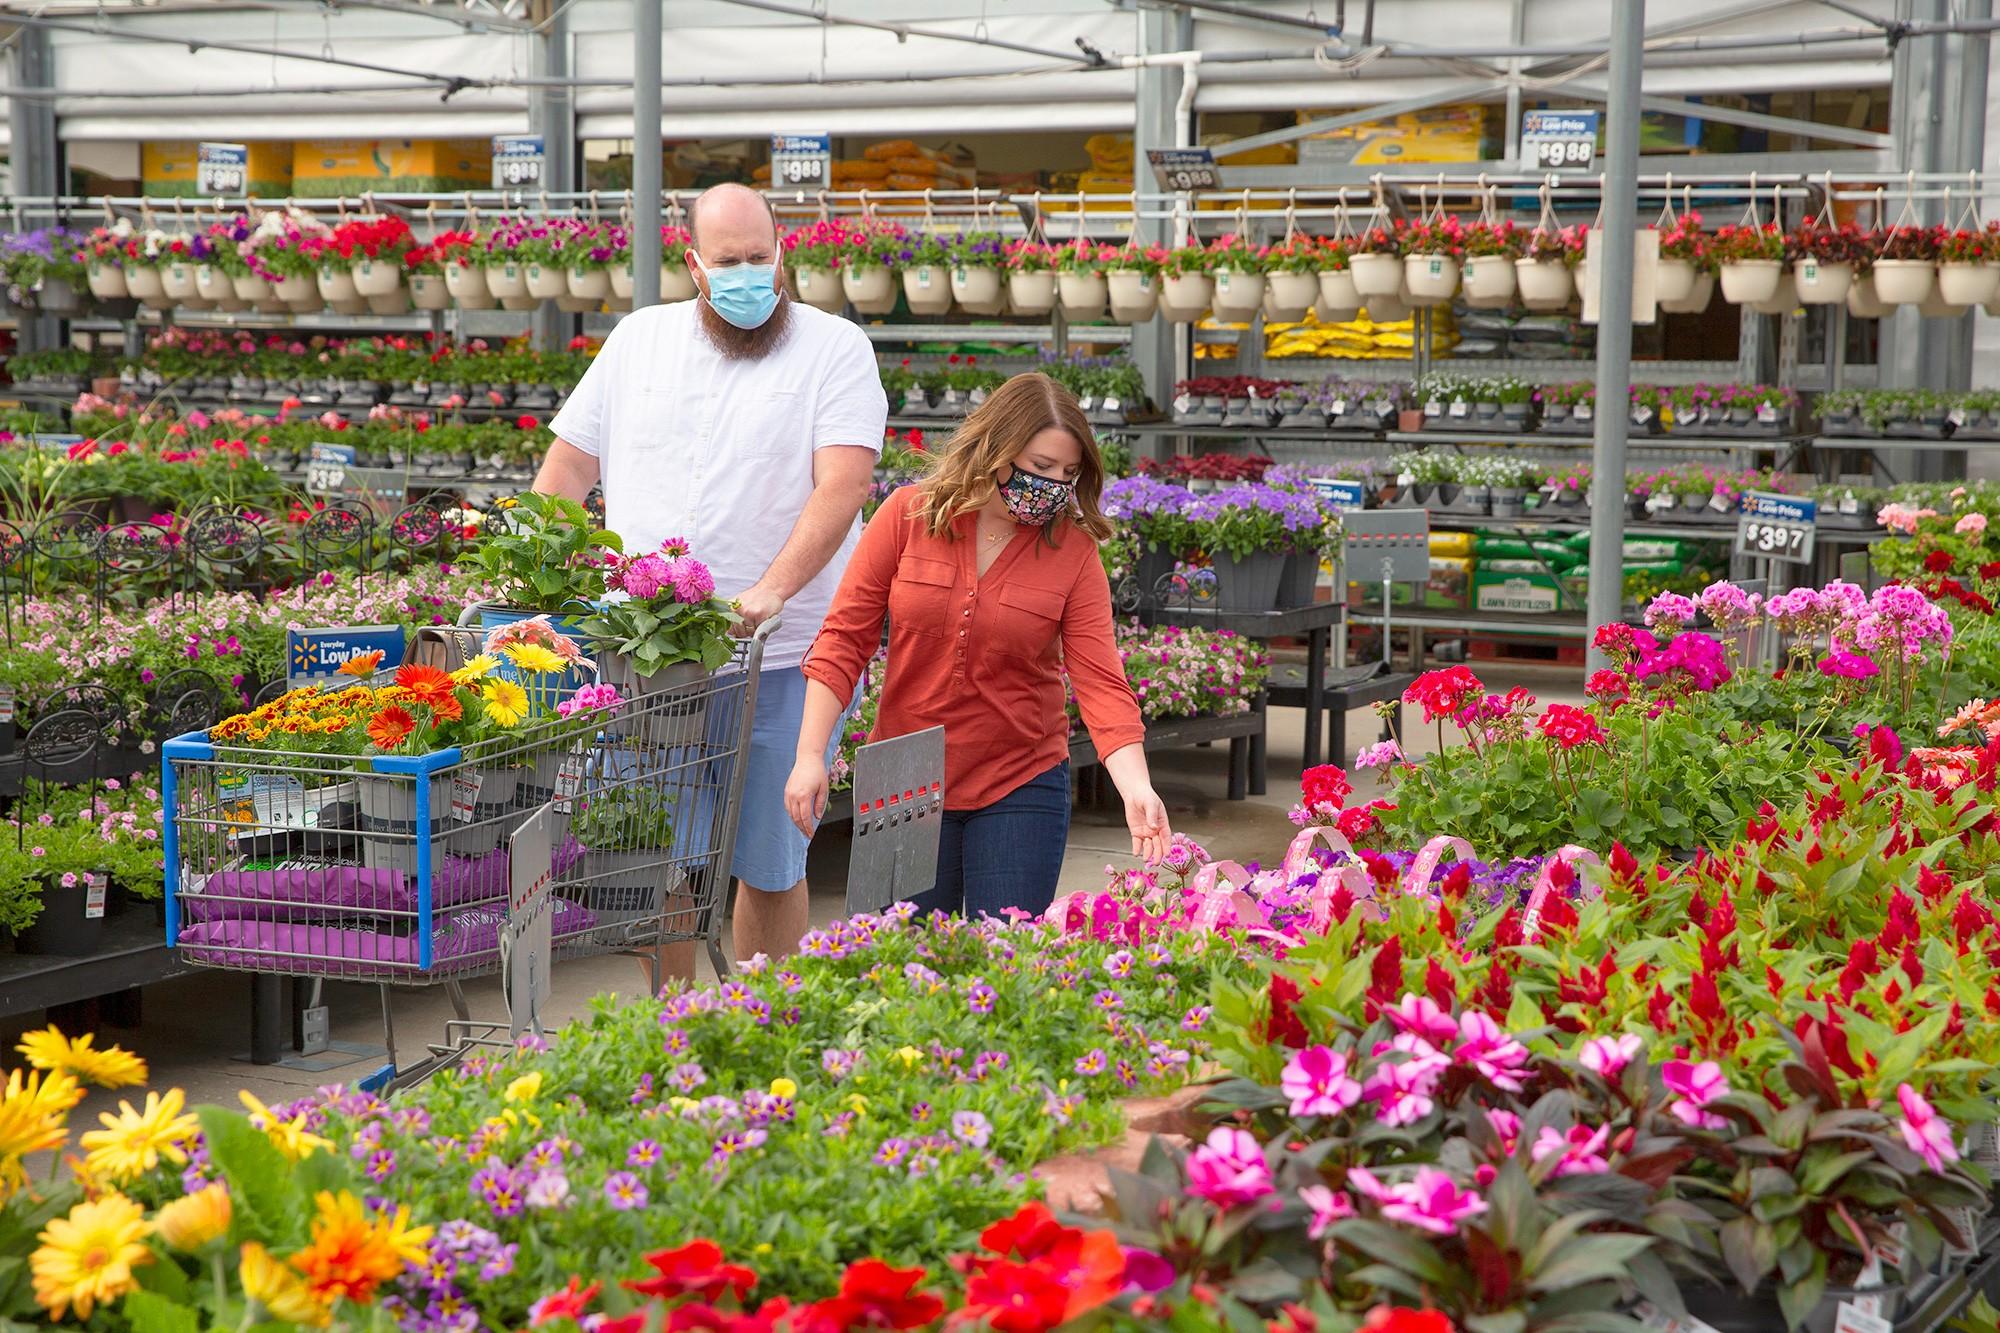 Customers Shopping in Garden Center